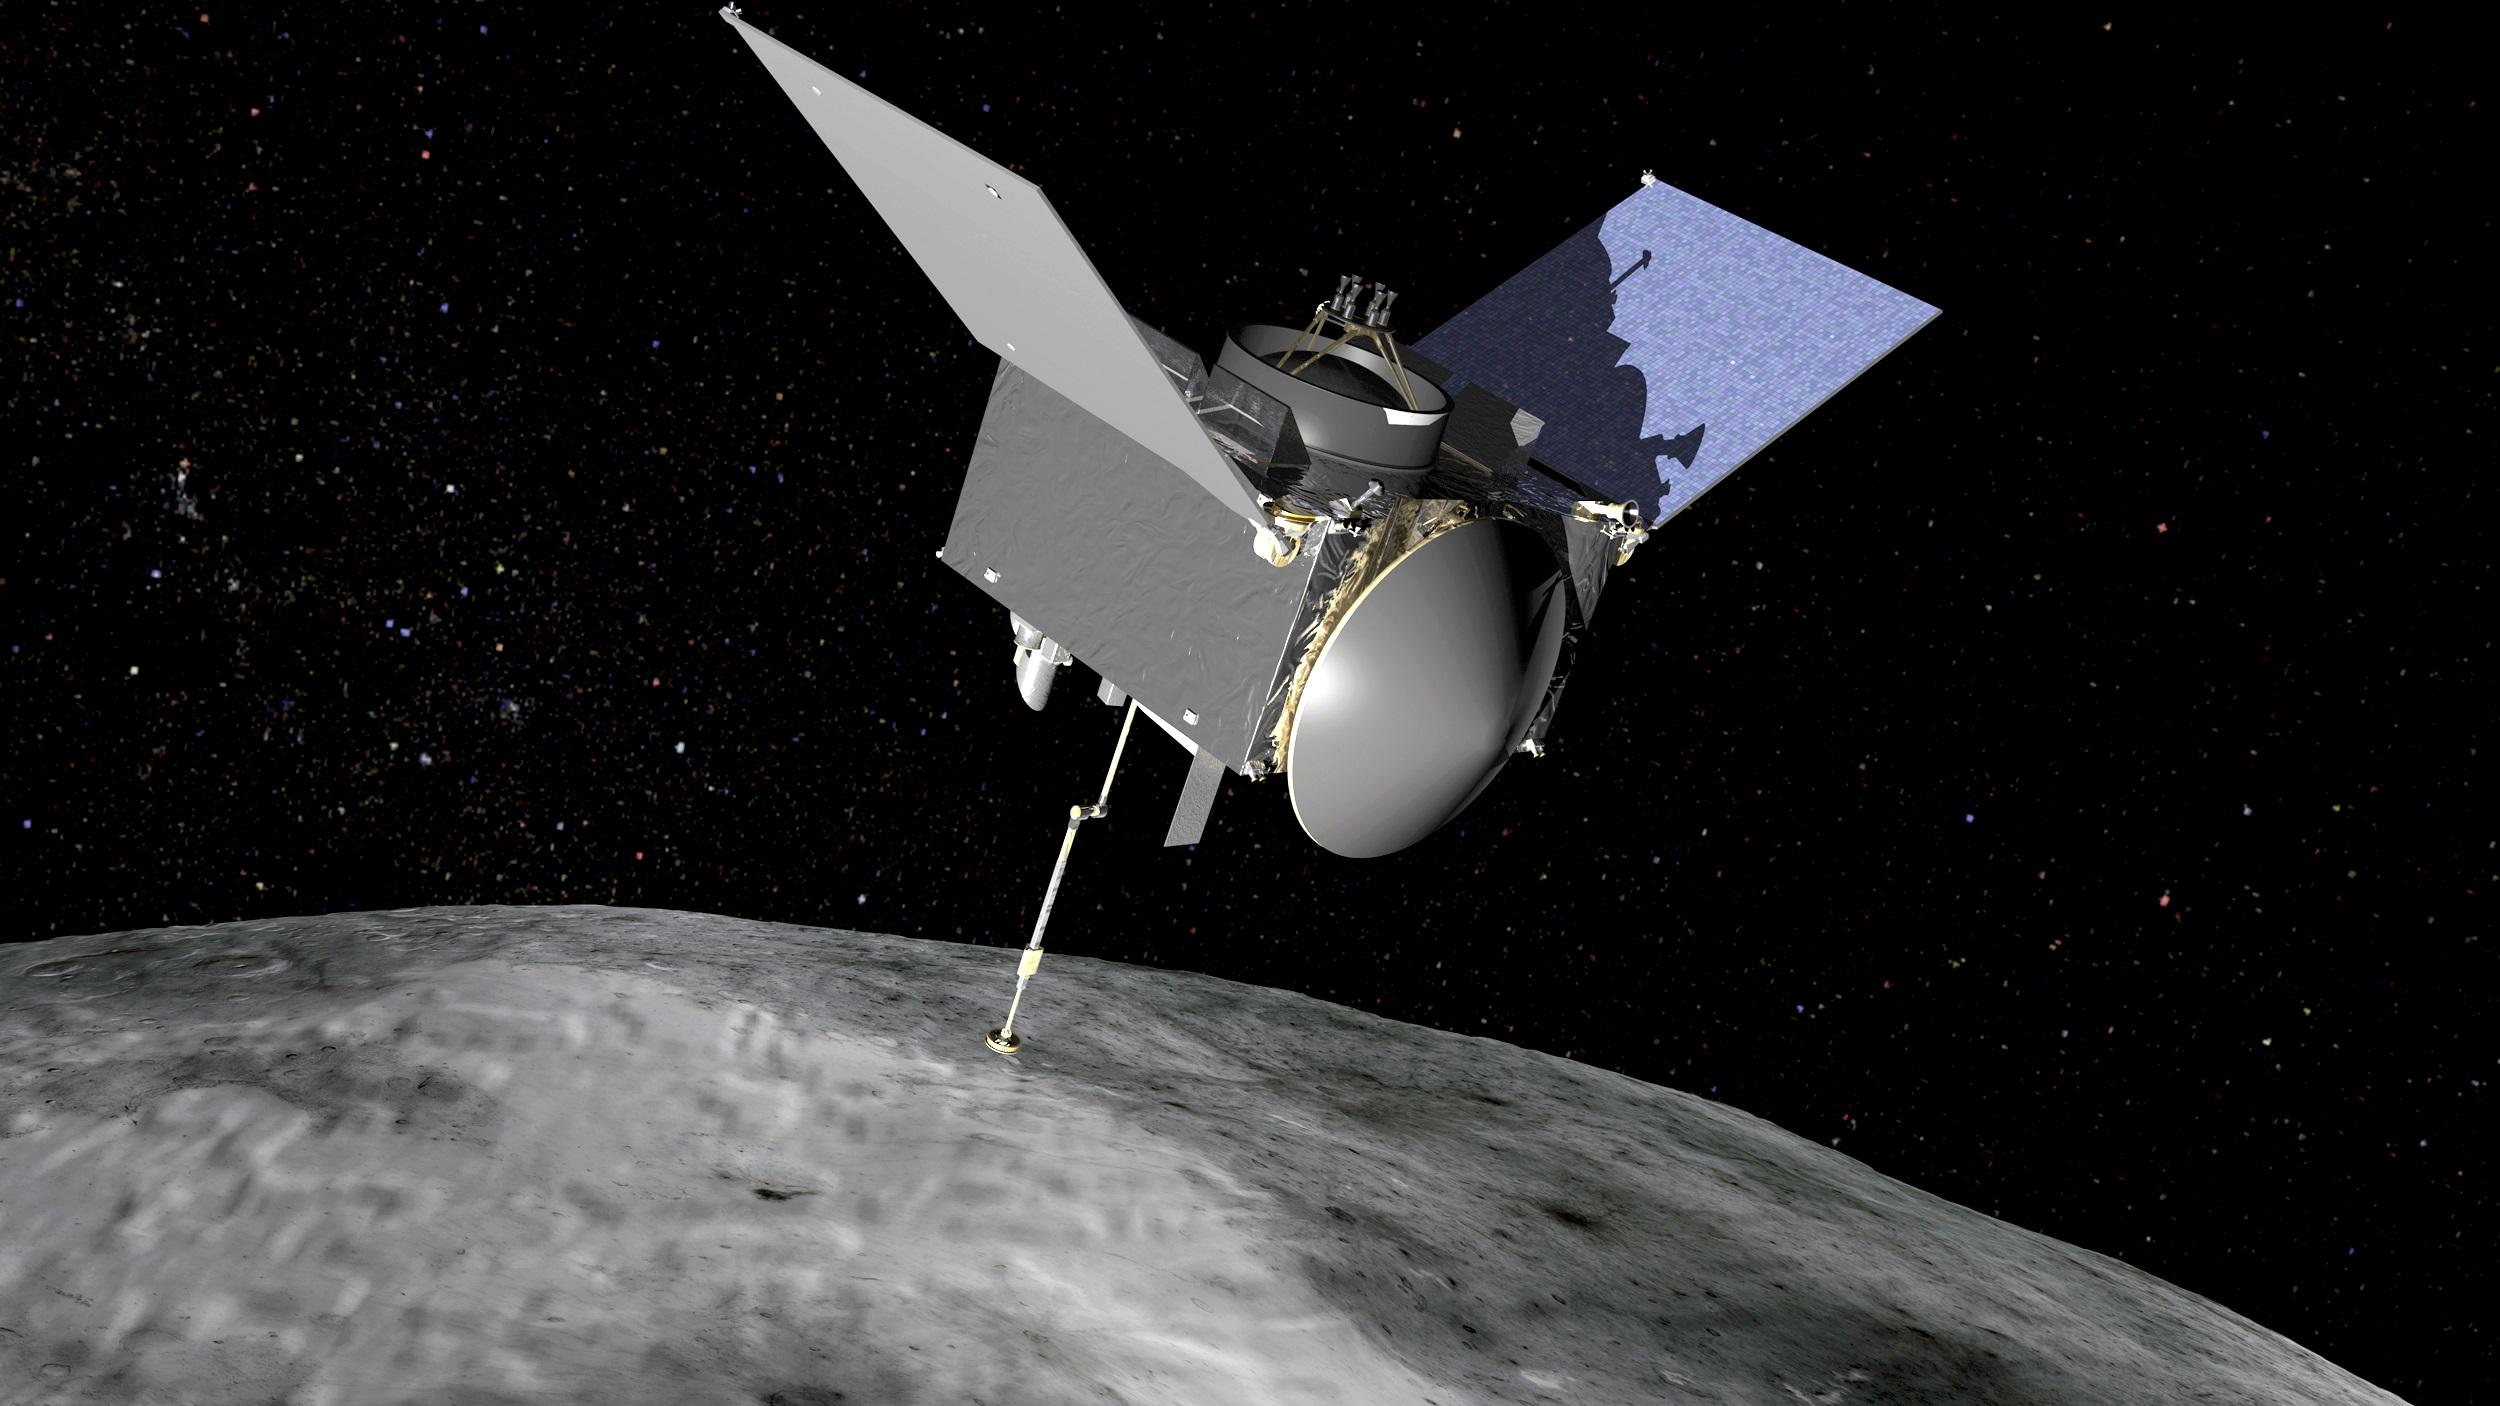 OSIRIS-REx first photographed the asteroid Bennu 10